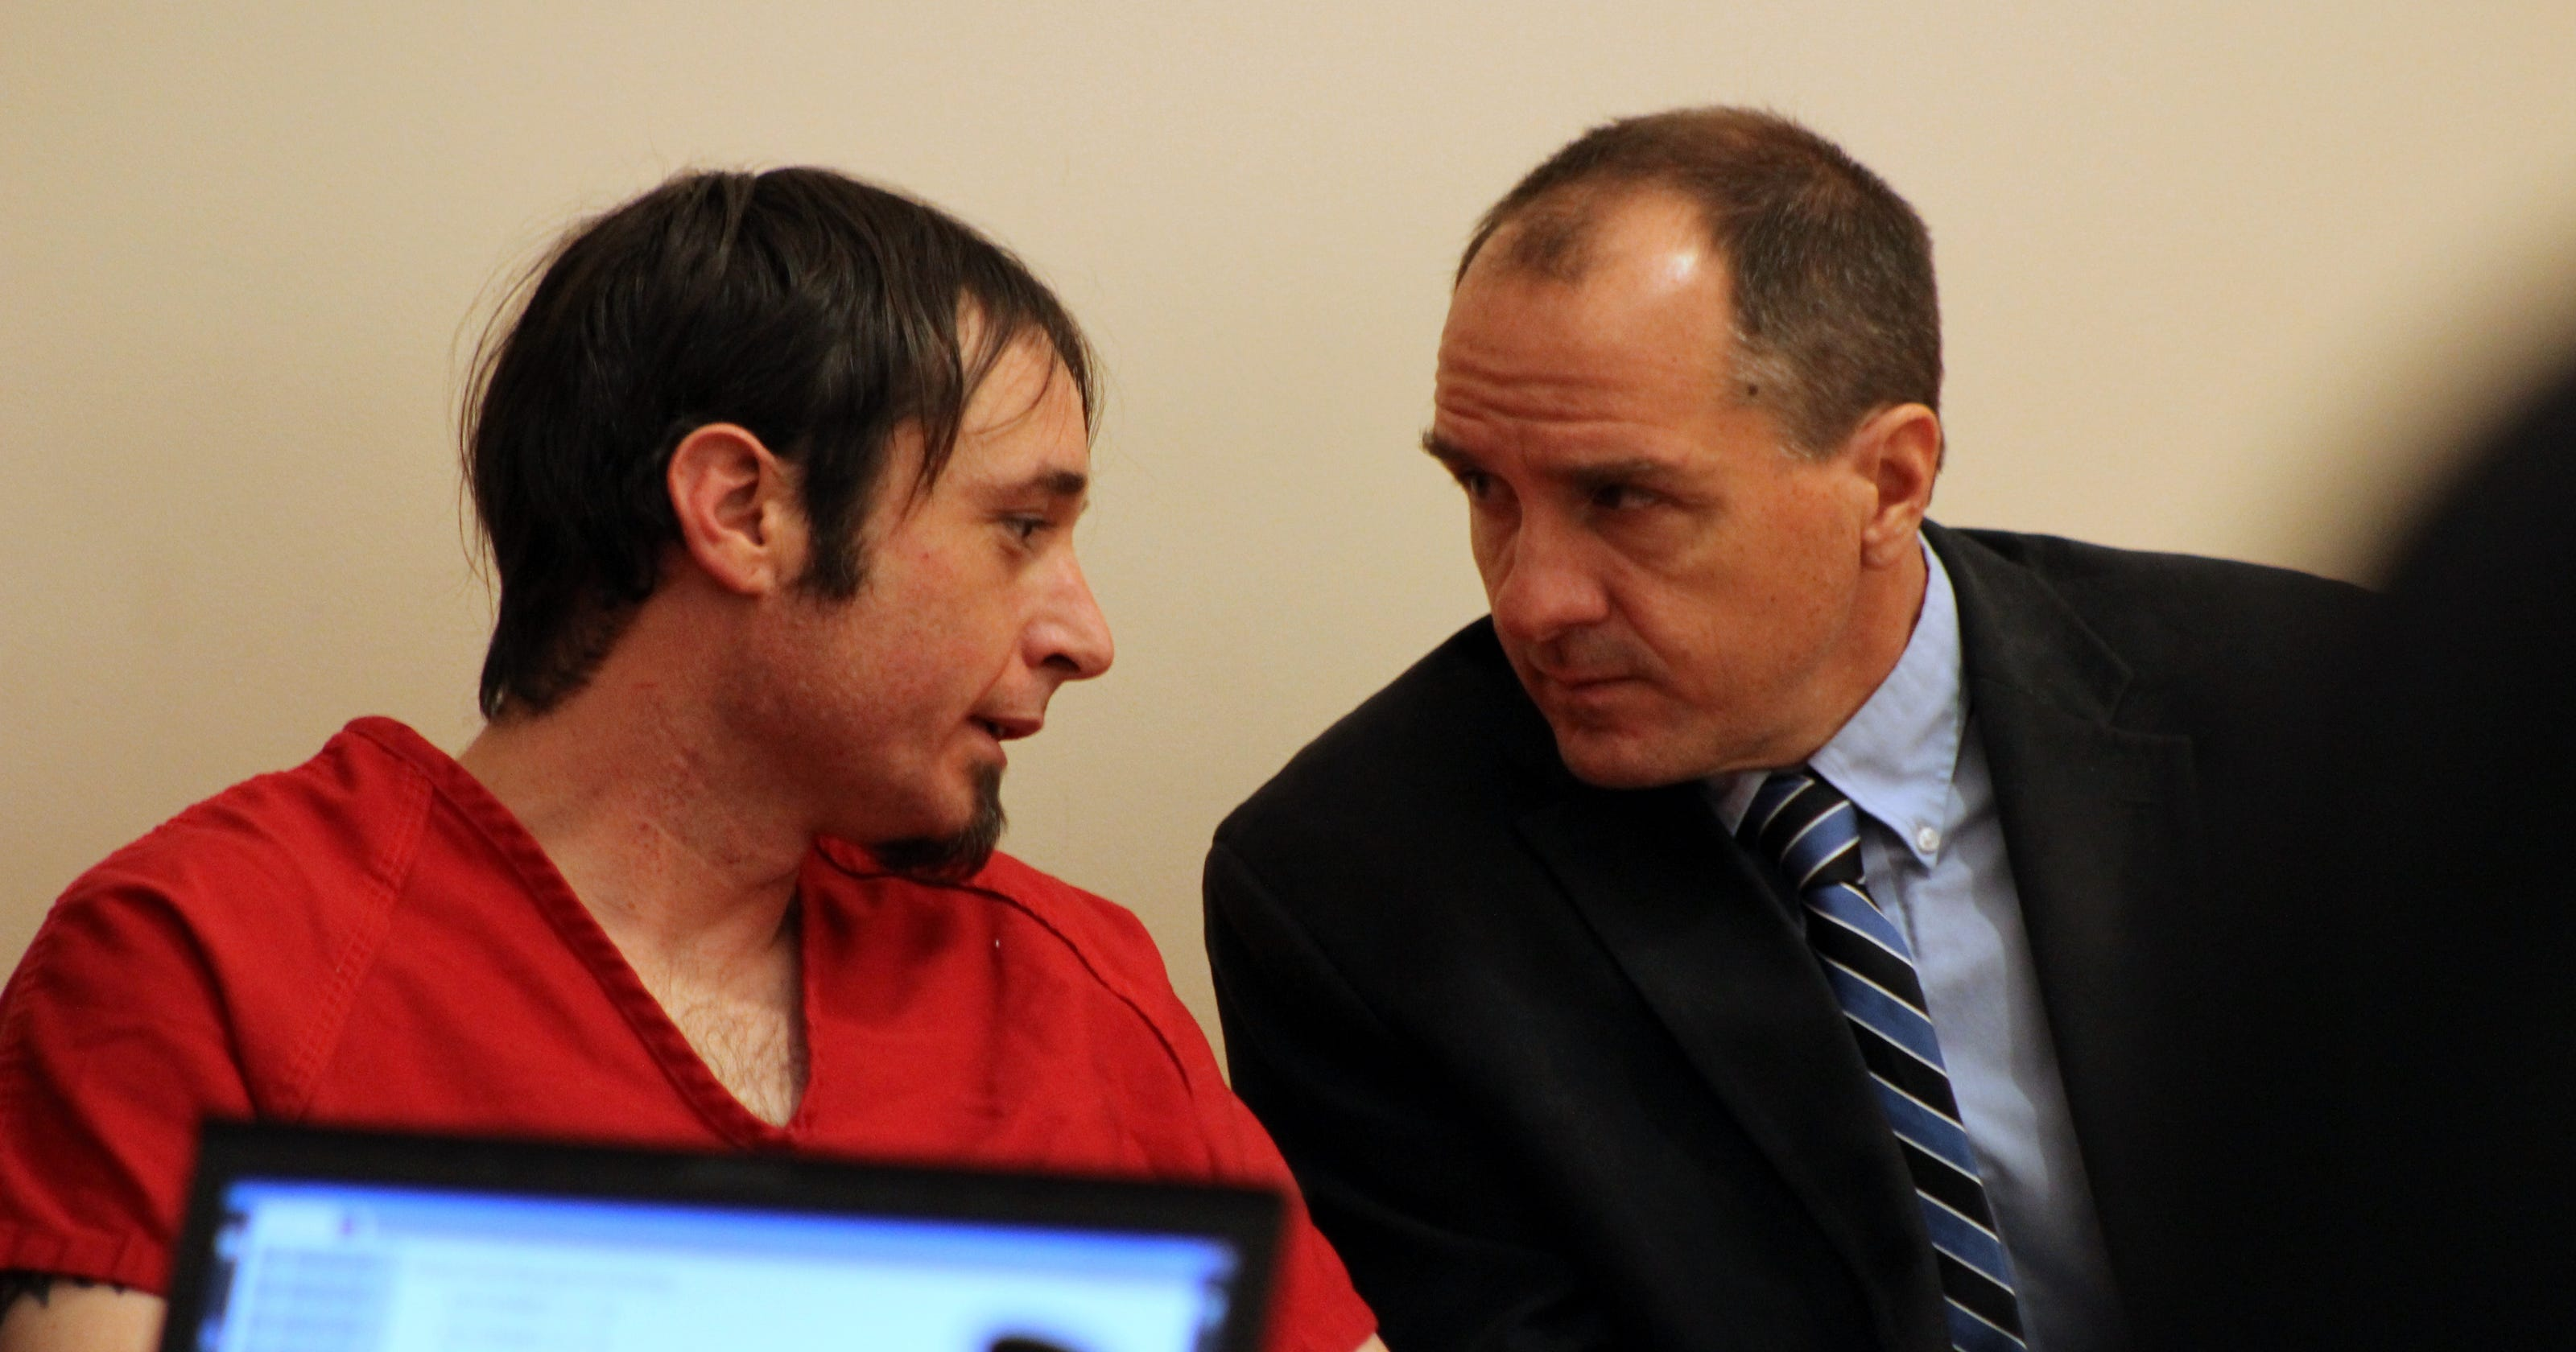 Judge orders mental competency exam for Loveland, Colorado man